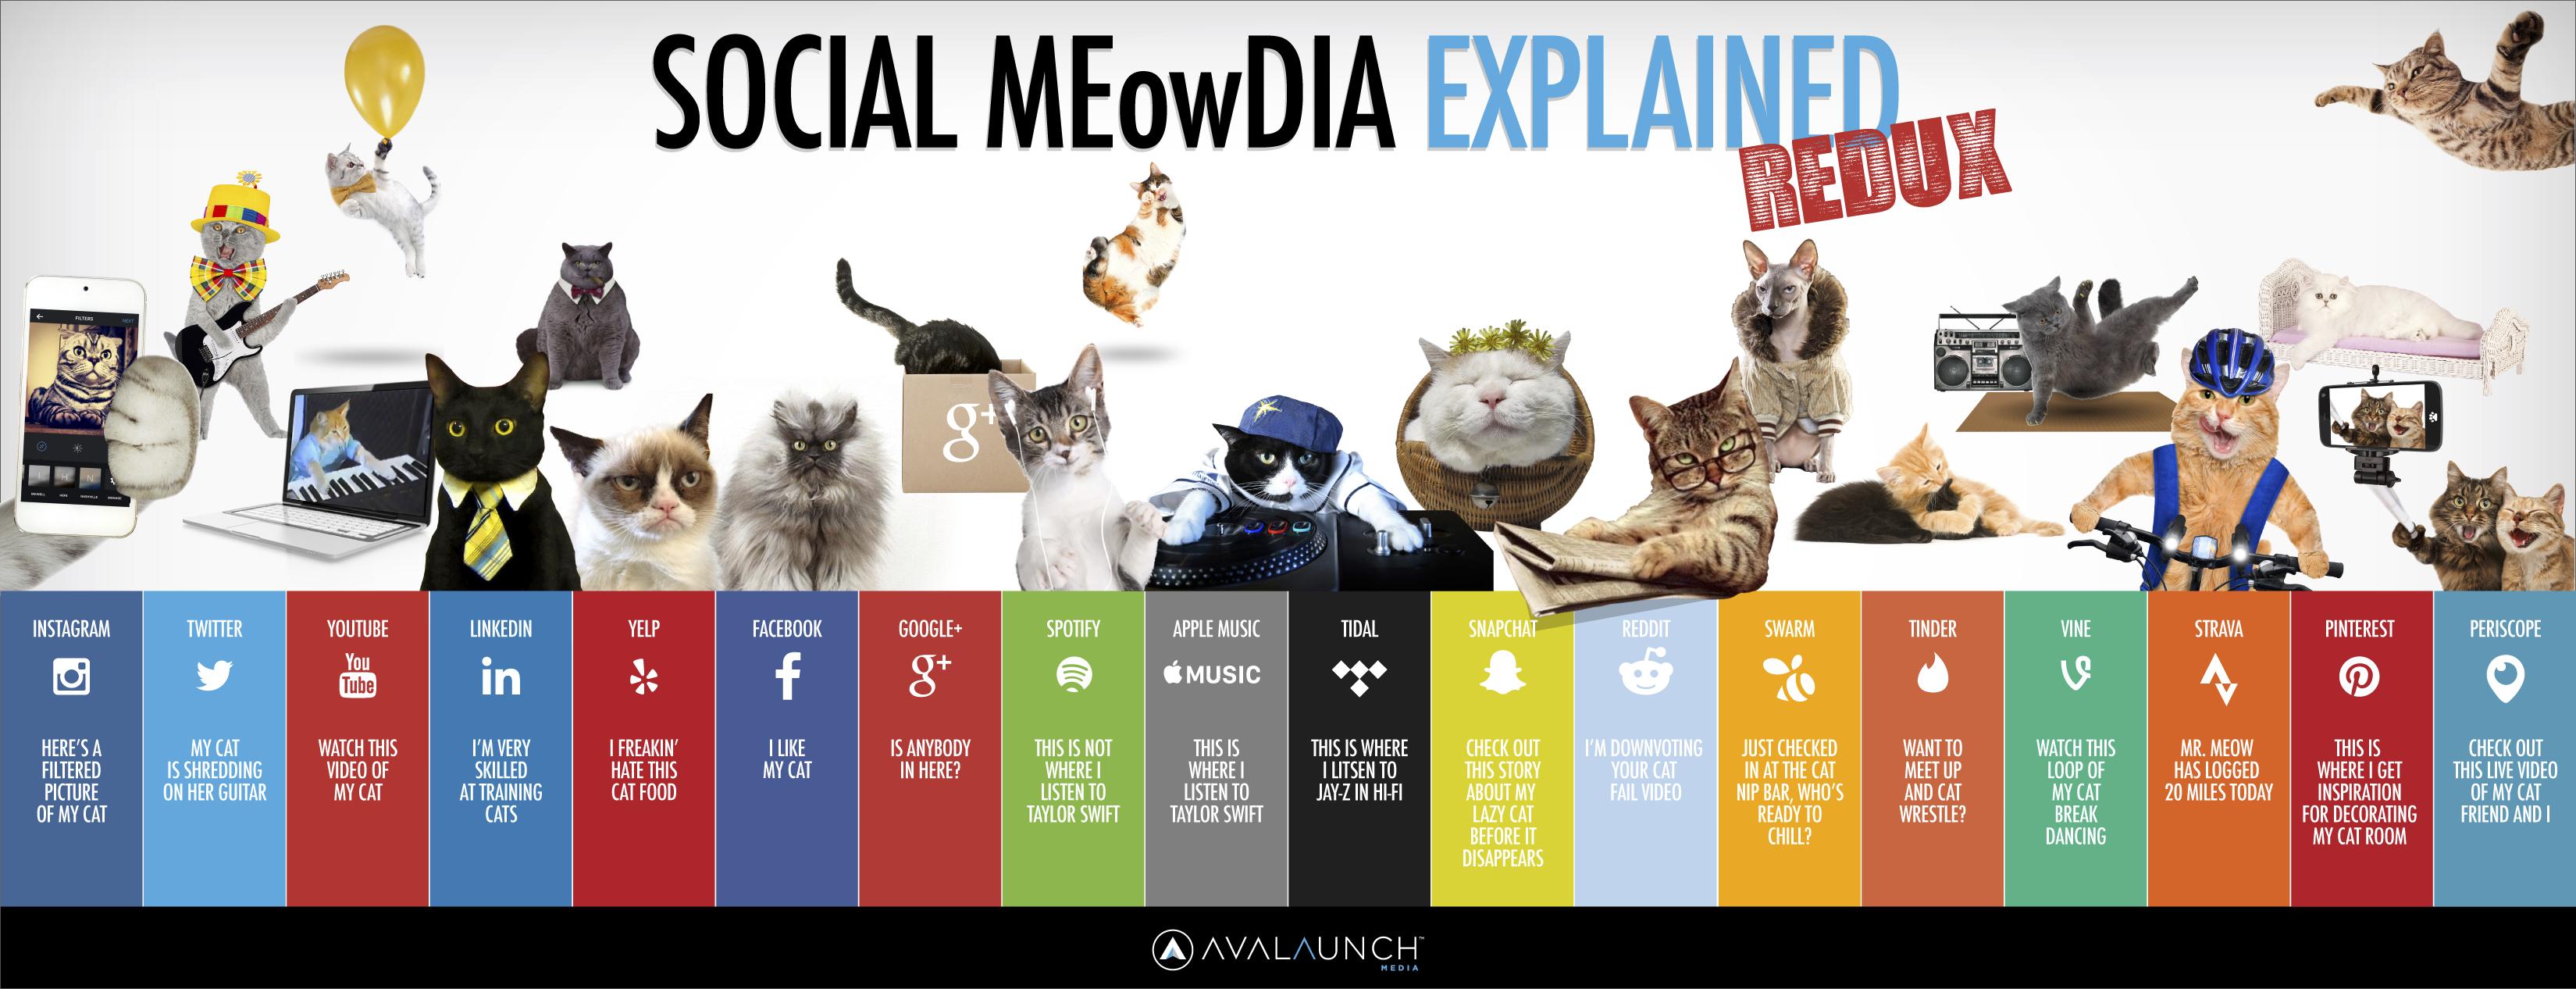 Social Meowdia Explained Redux